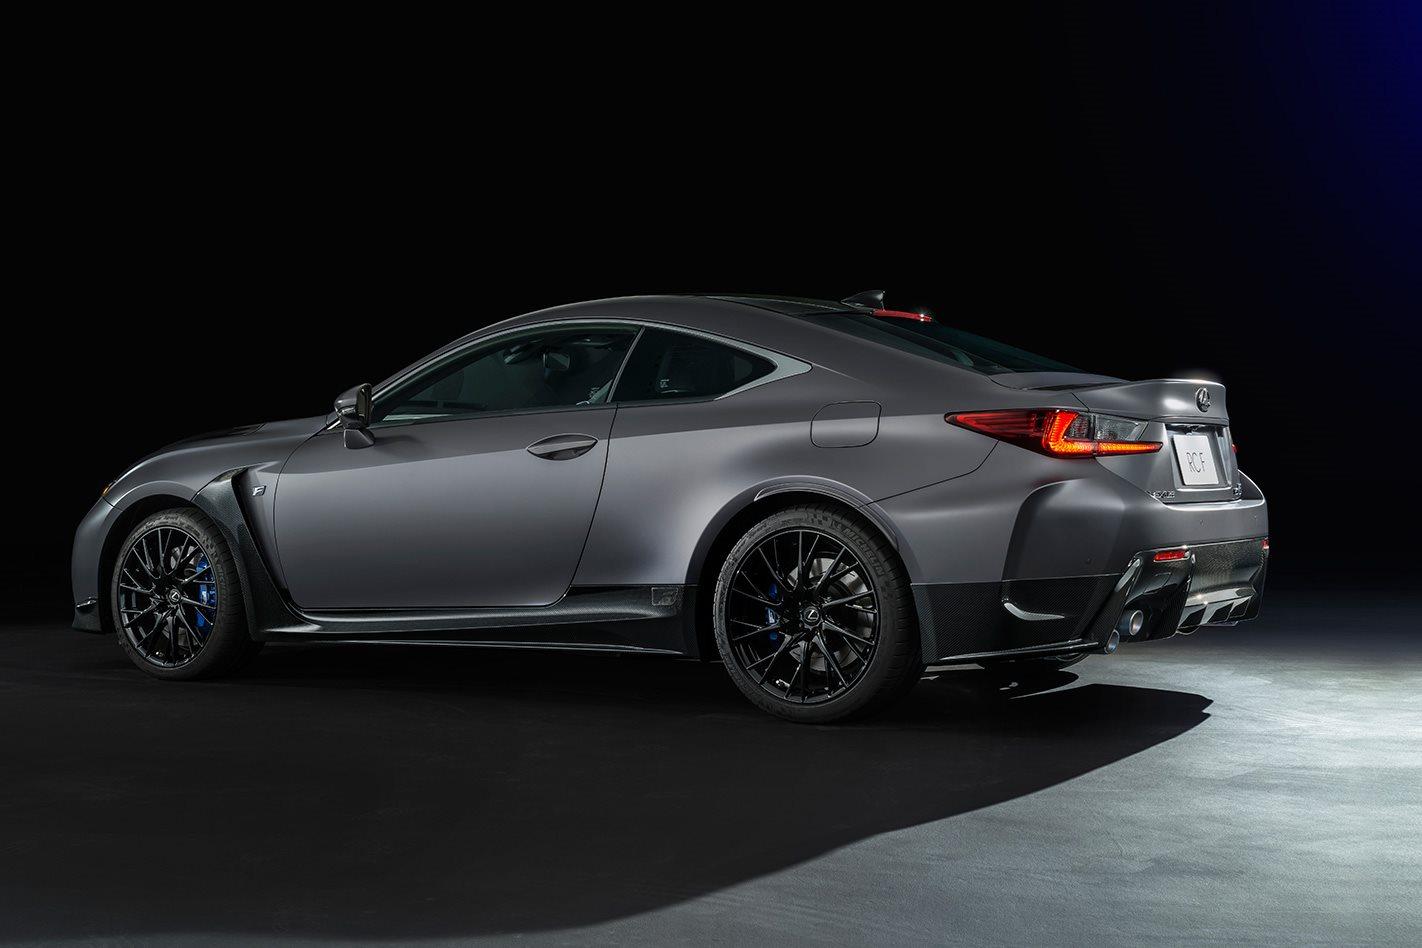 Lexus-RC-F-coupe-rear.jpg